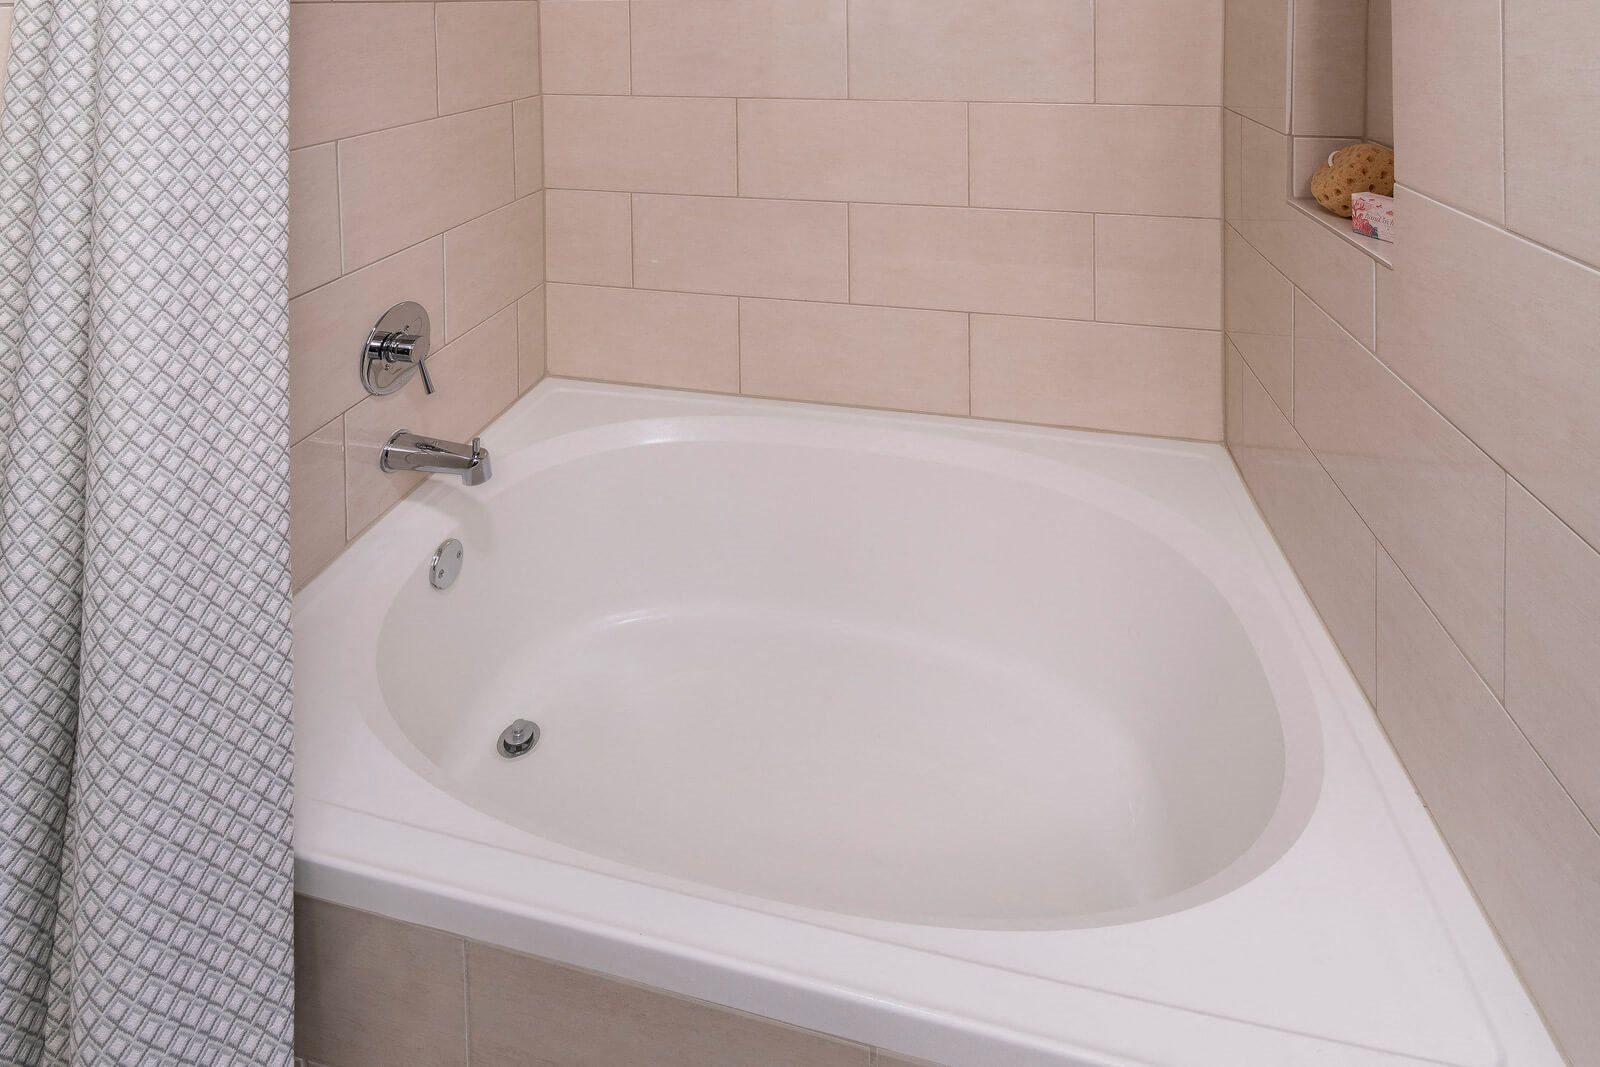 Spa-Inspired Bathtubs at Windsor Old Fourth Ward, 608 Ralph McGill Blvd NE, GA